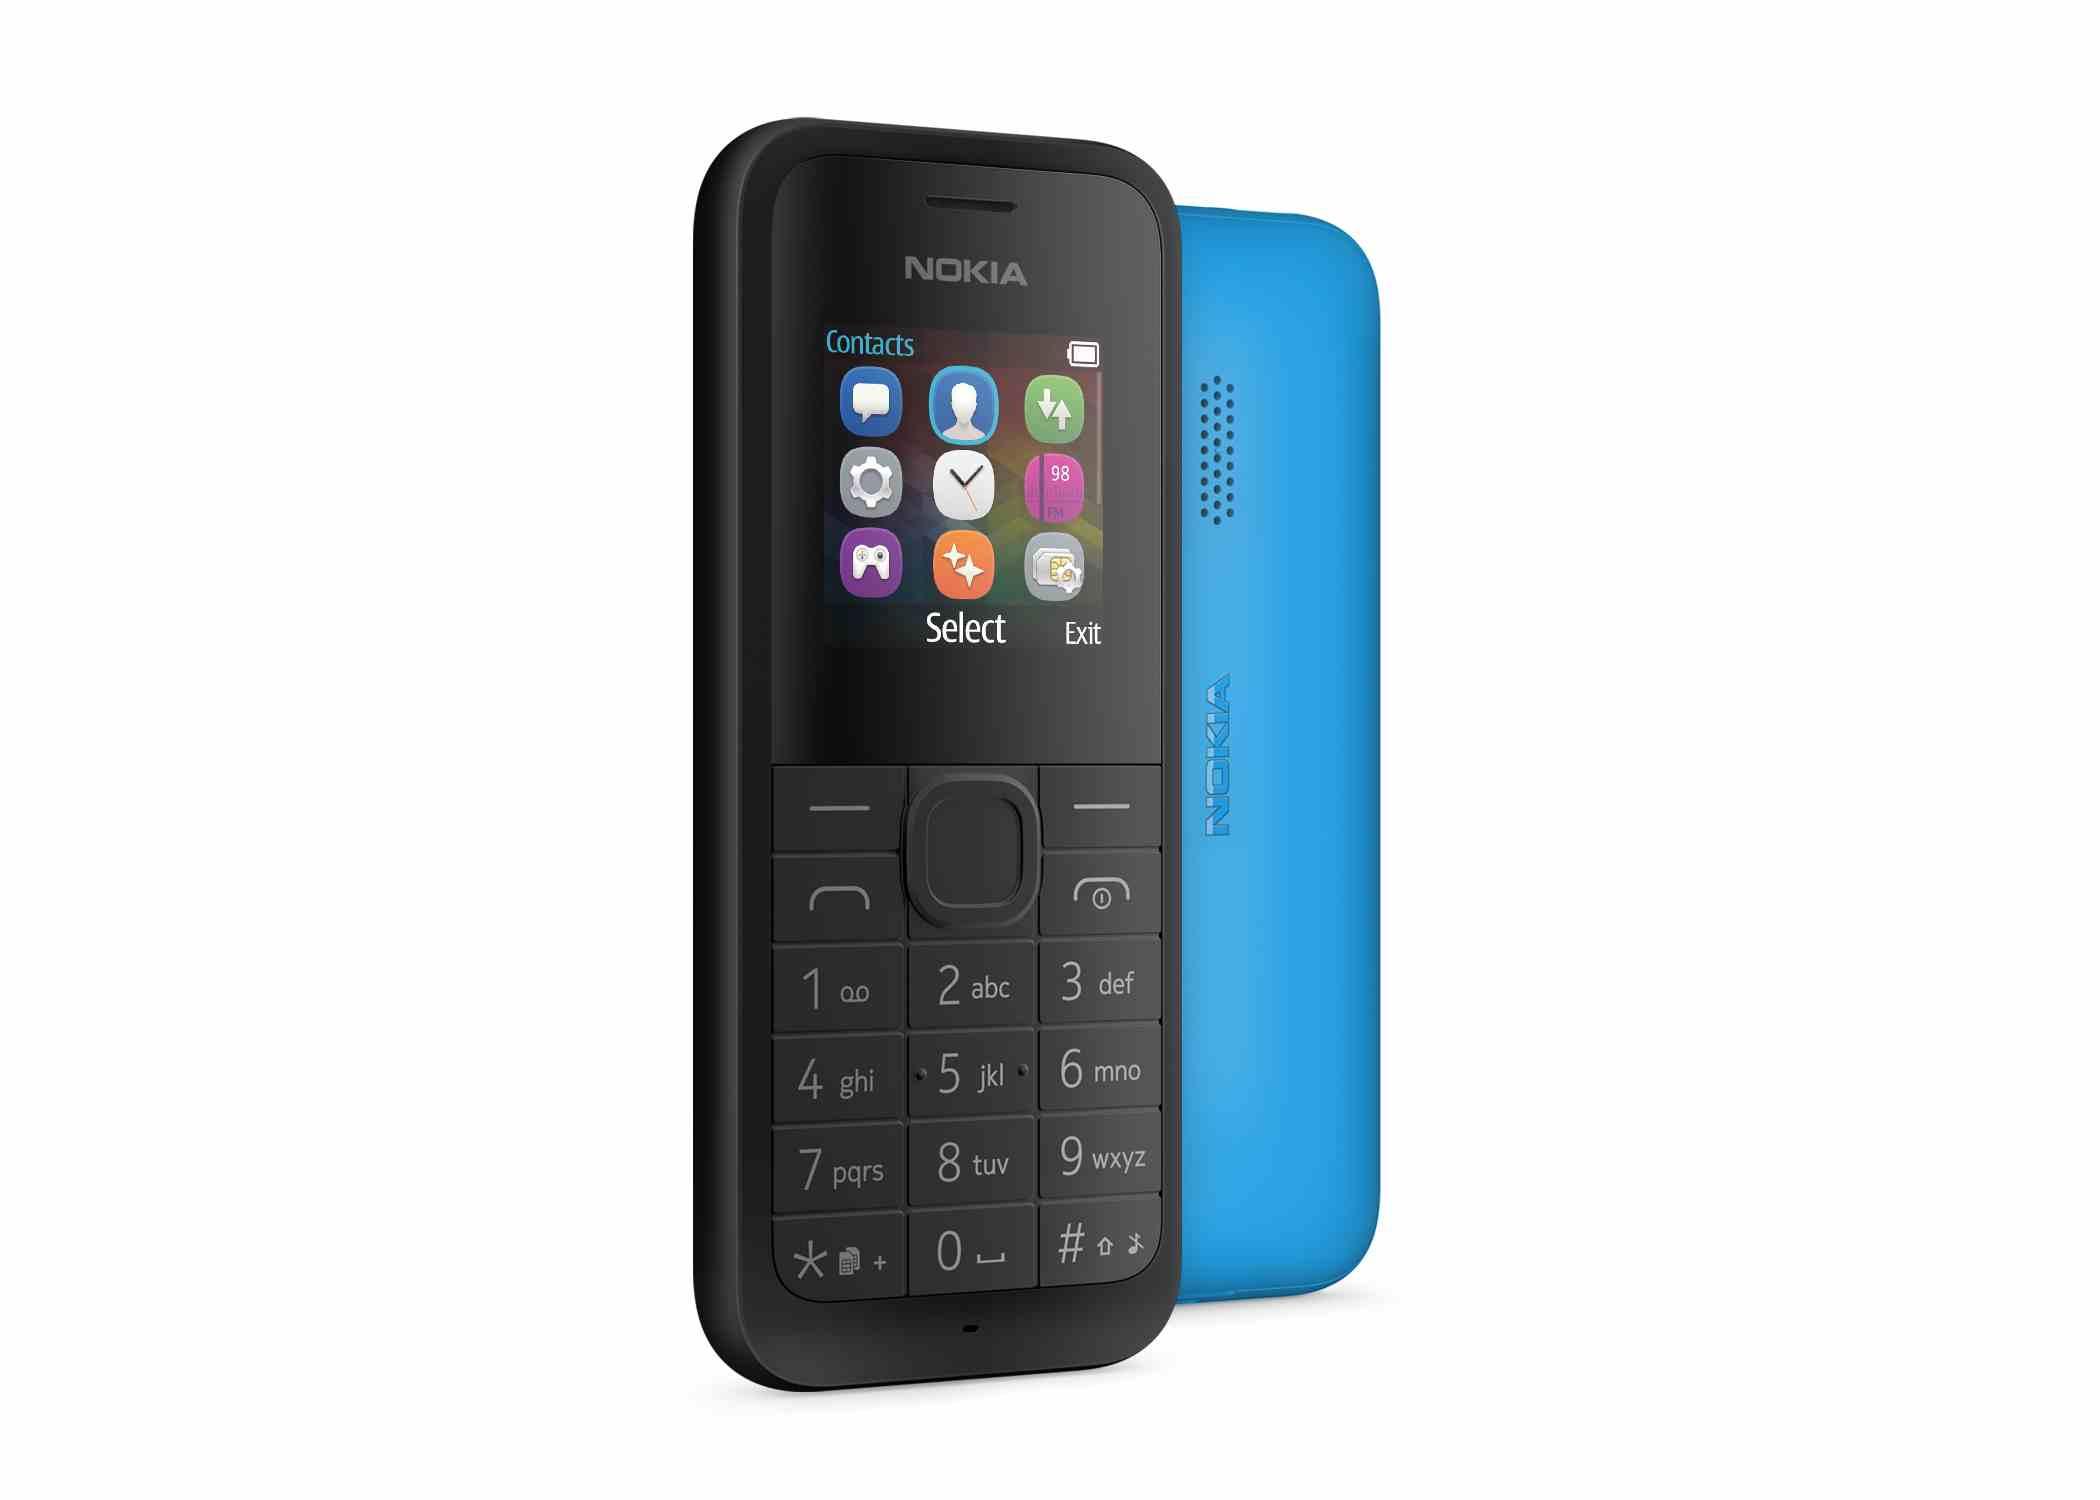 ارخص جوال نوكيا Nokia 105 المرسال